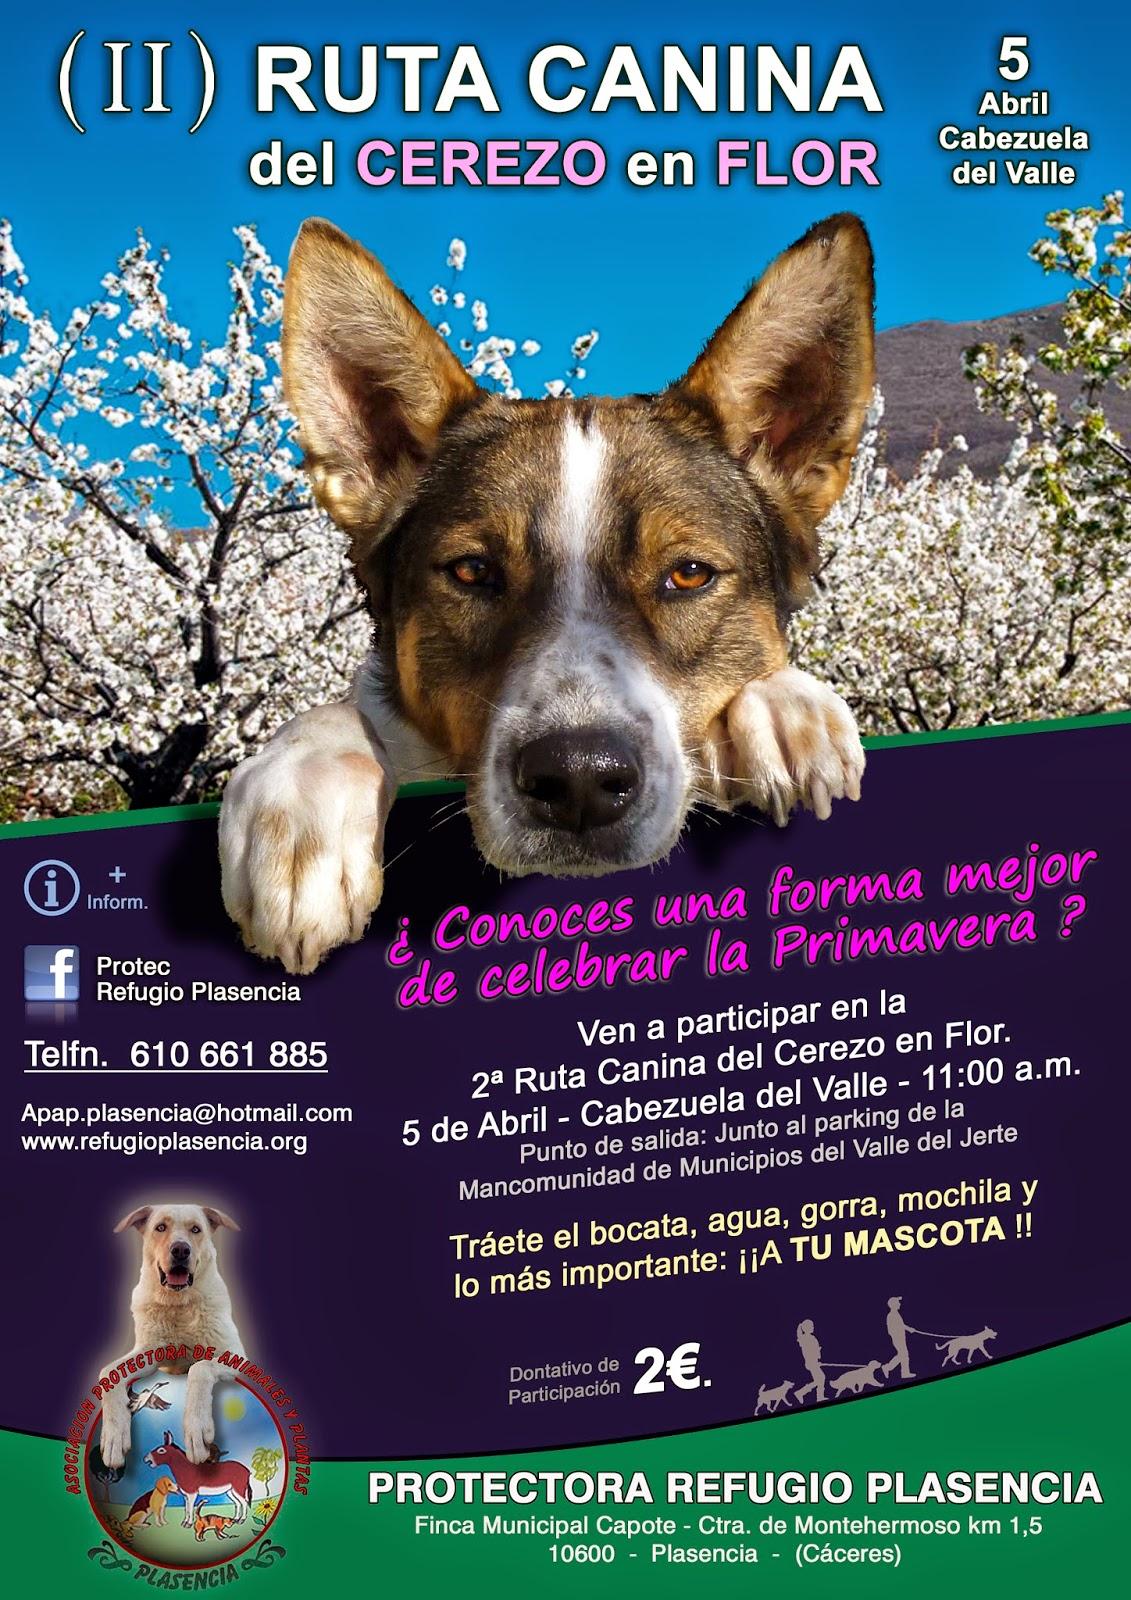 Ruta canina del Cerezo en Flor. Valle del Jerte.